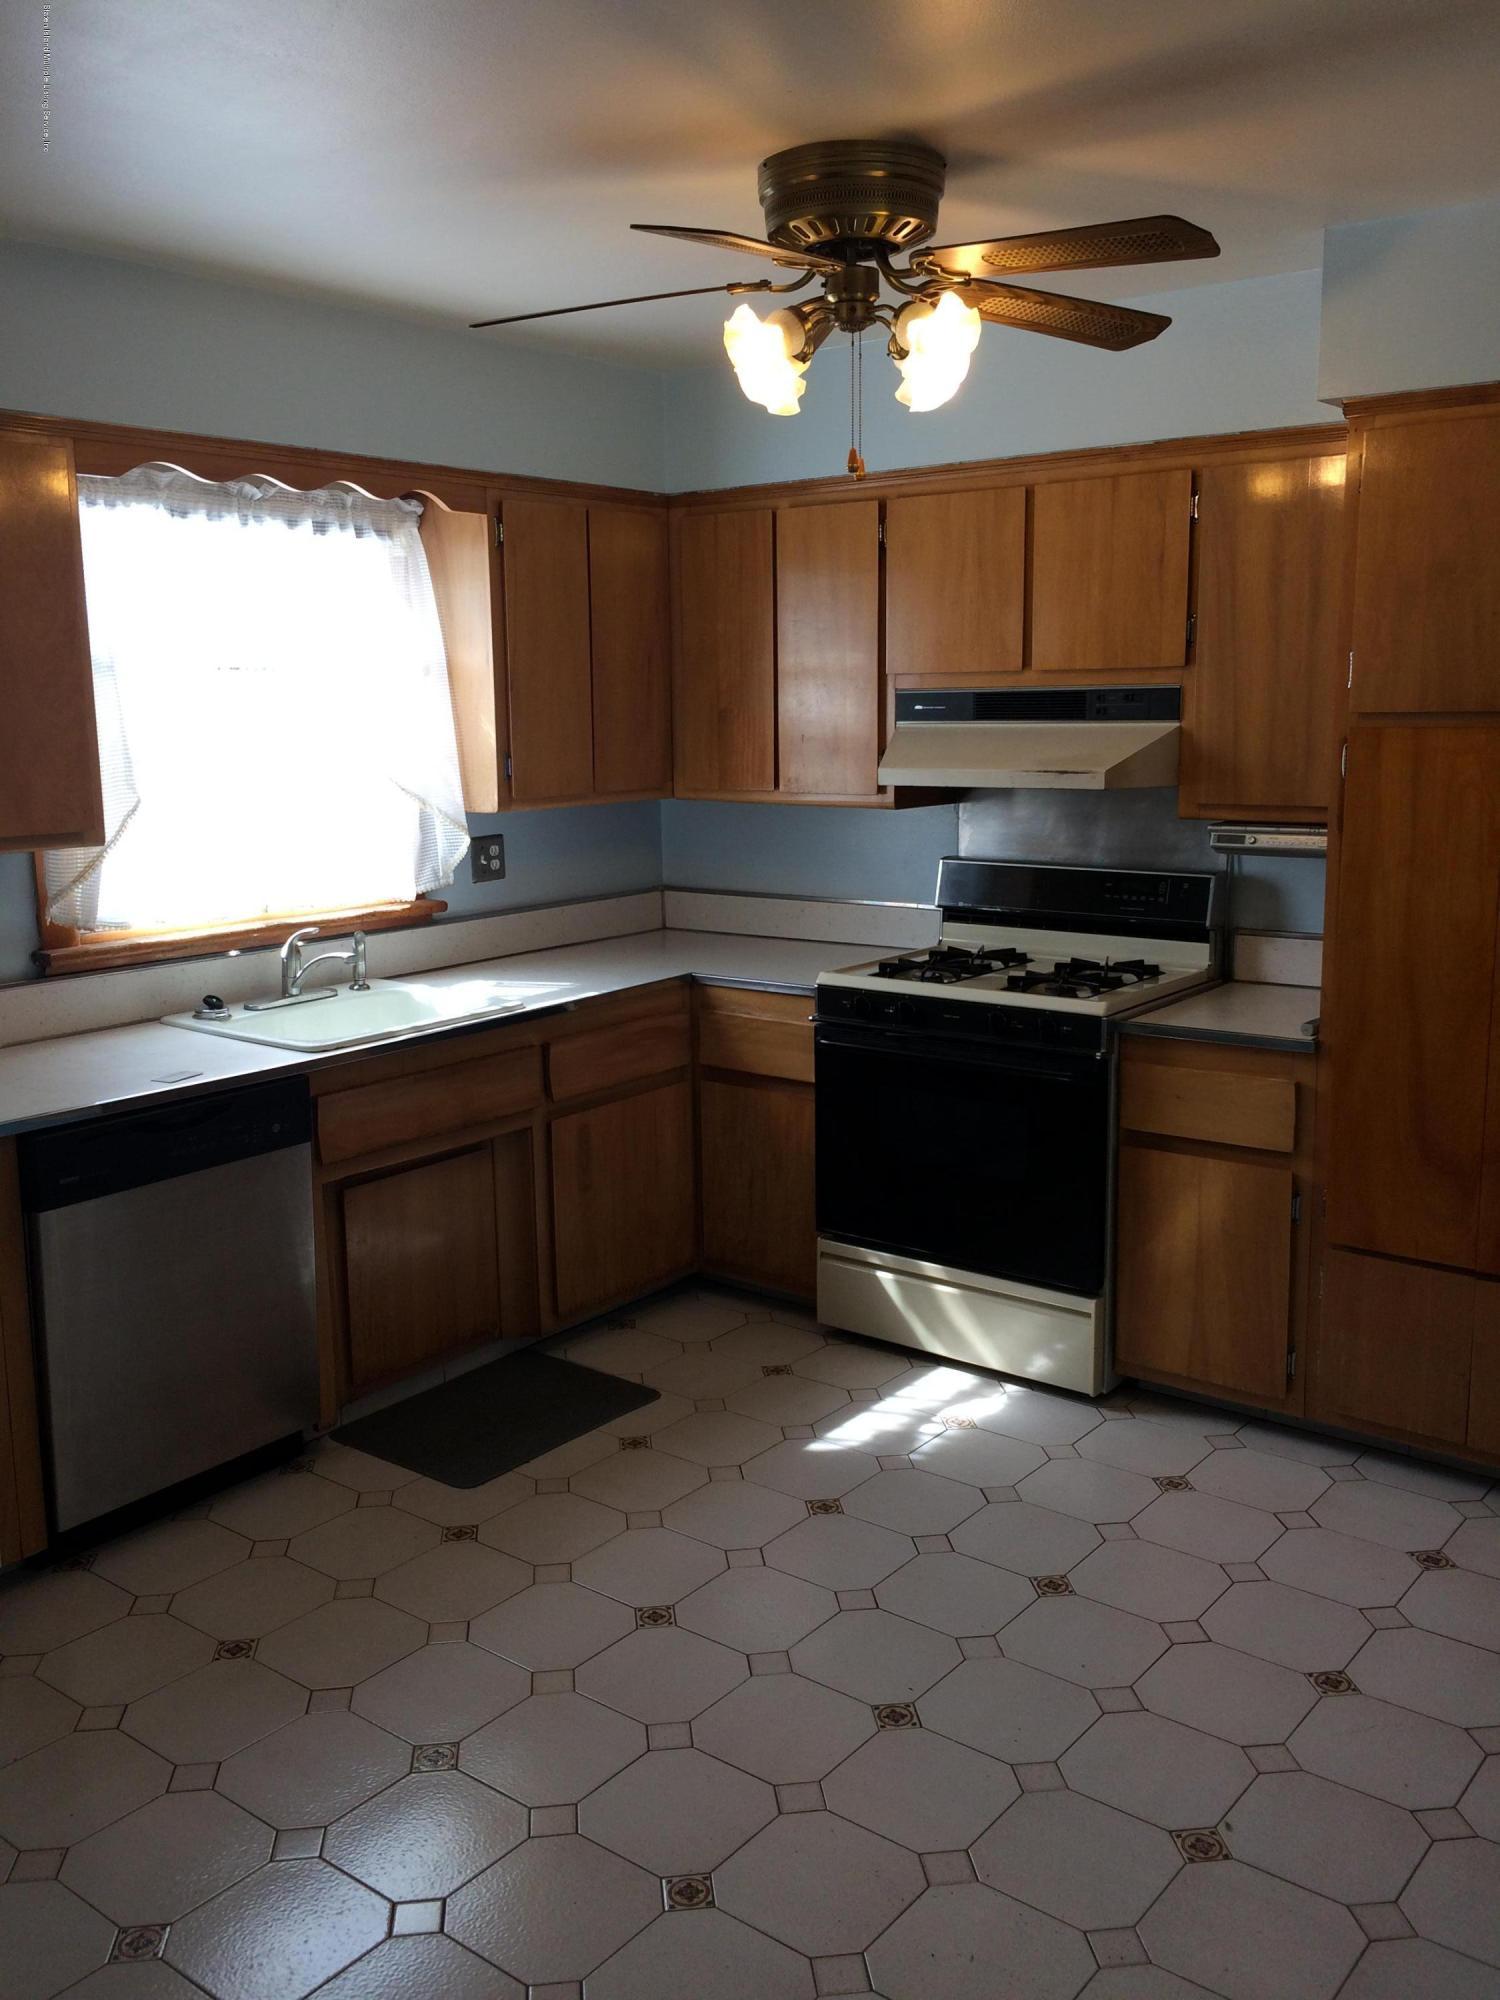 Single Family - Semi-Attached 30 Bent Street  Staten Island, NY 10312, MLS-1130498-10